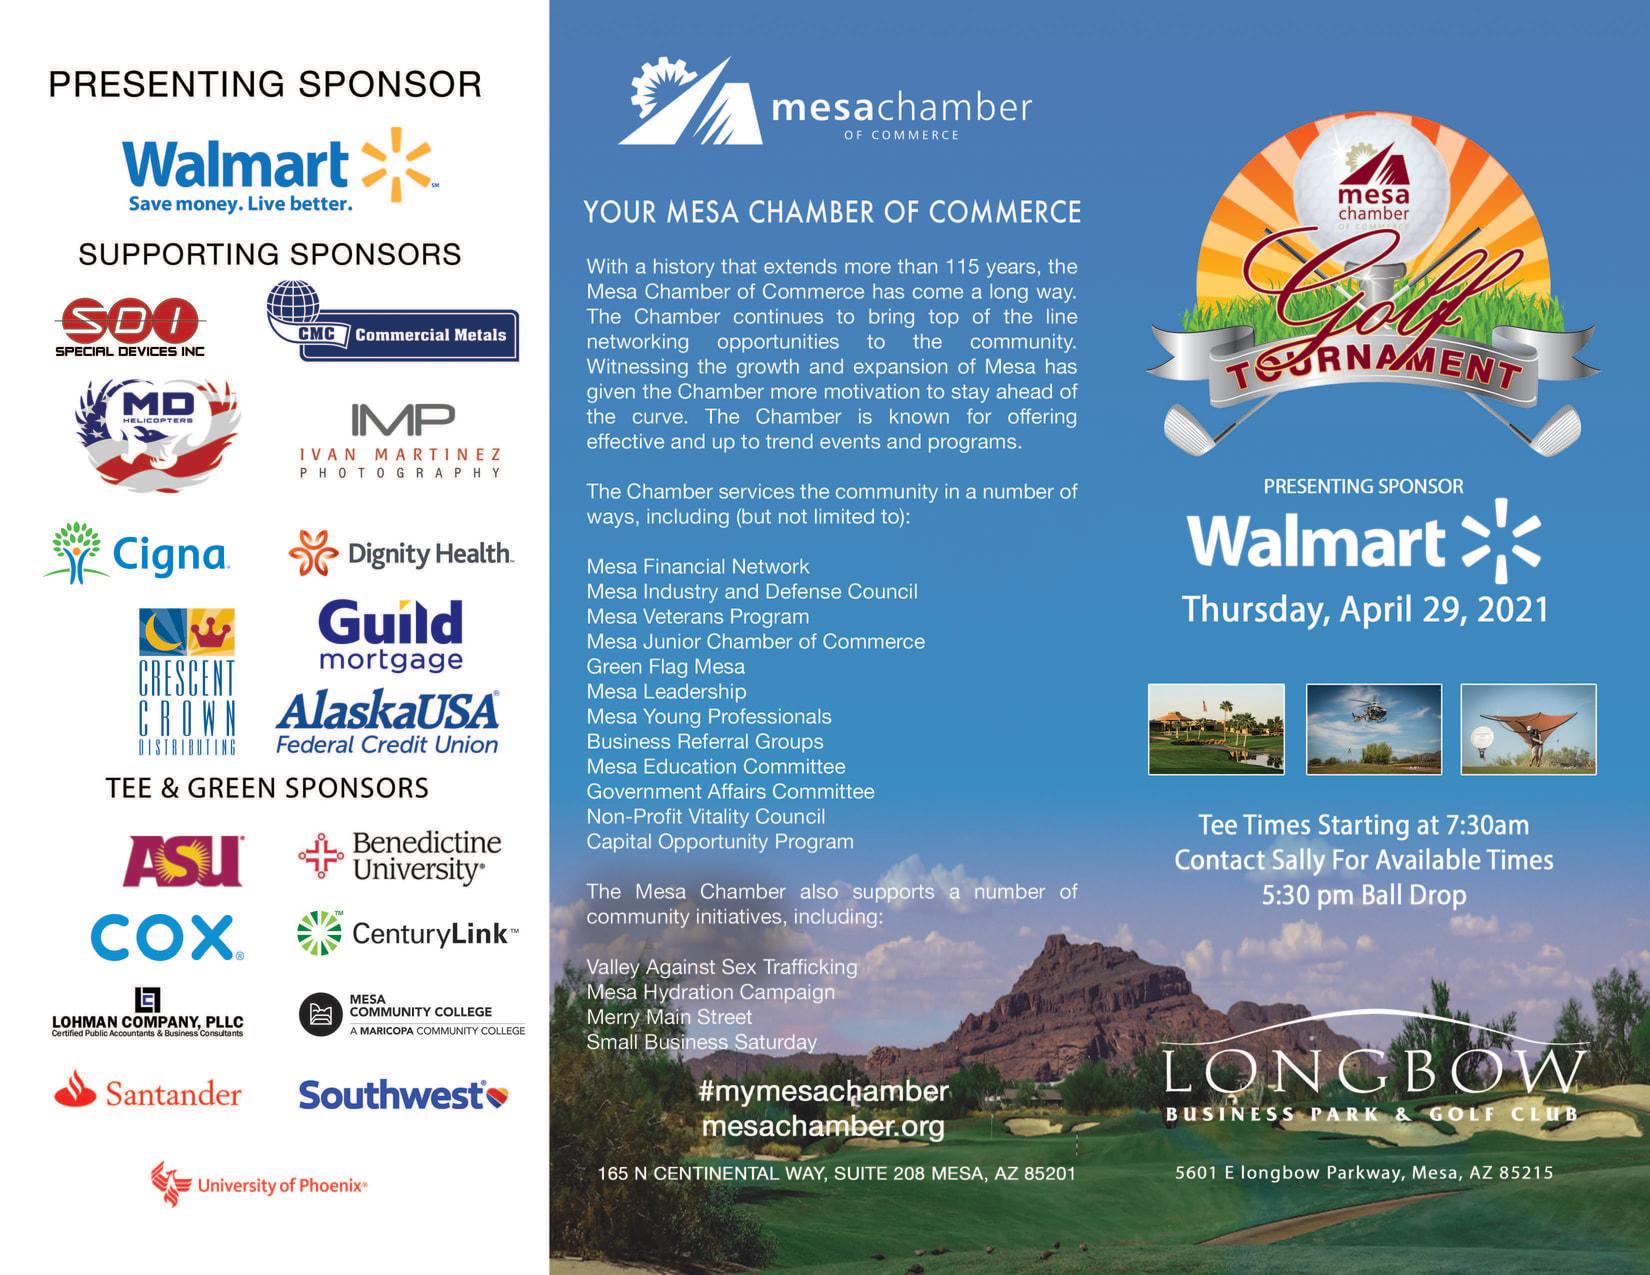 https://www.mesachamber.org/events/details/2021-mesa-chamber-annual-golf-tournament-23355